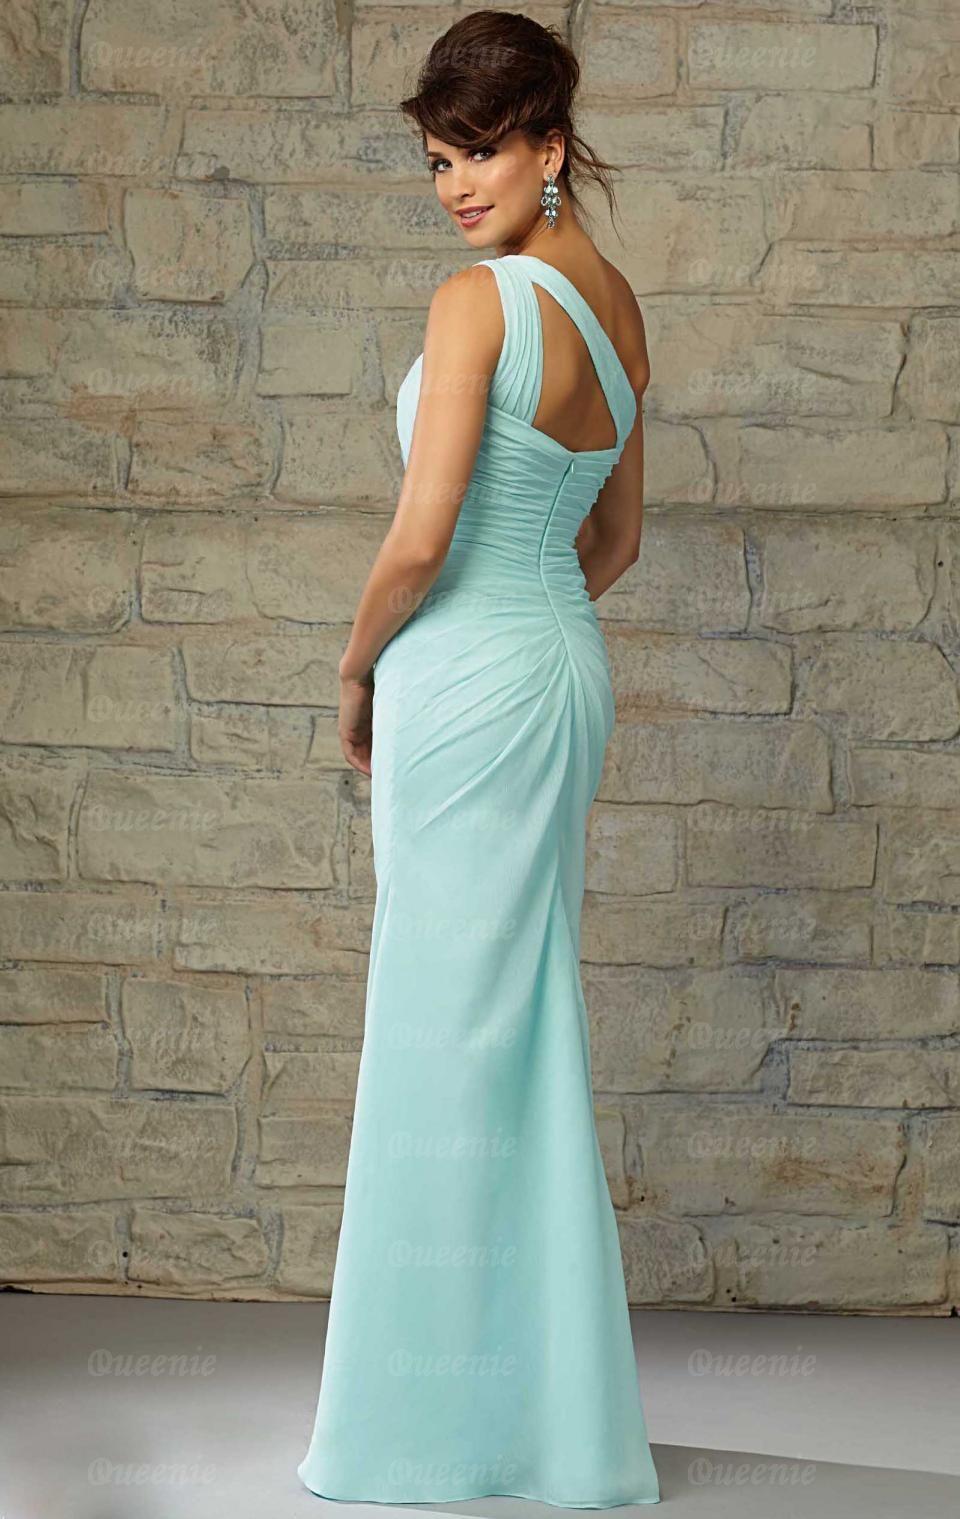 Unusual Chiffon Blue Green Bridesmaid Dresses BNNCA0004-Bridesmaid ...